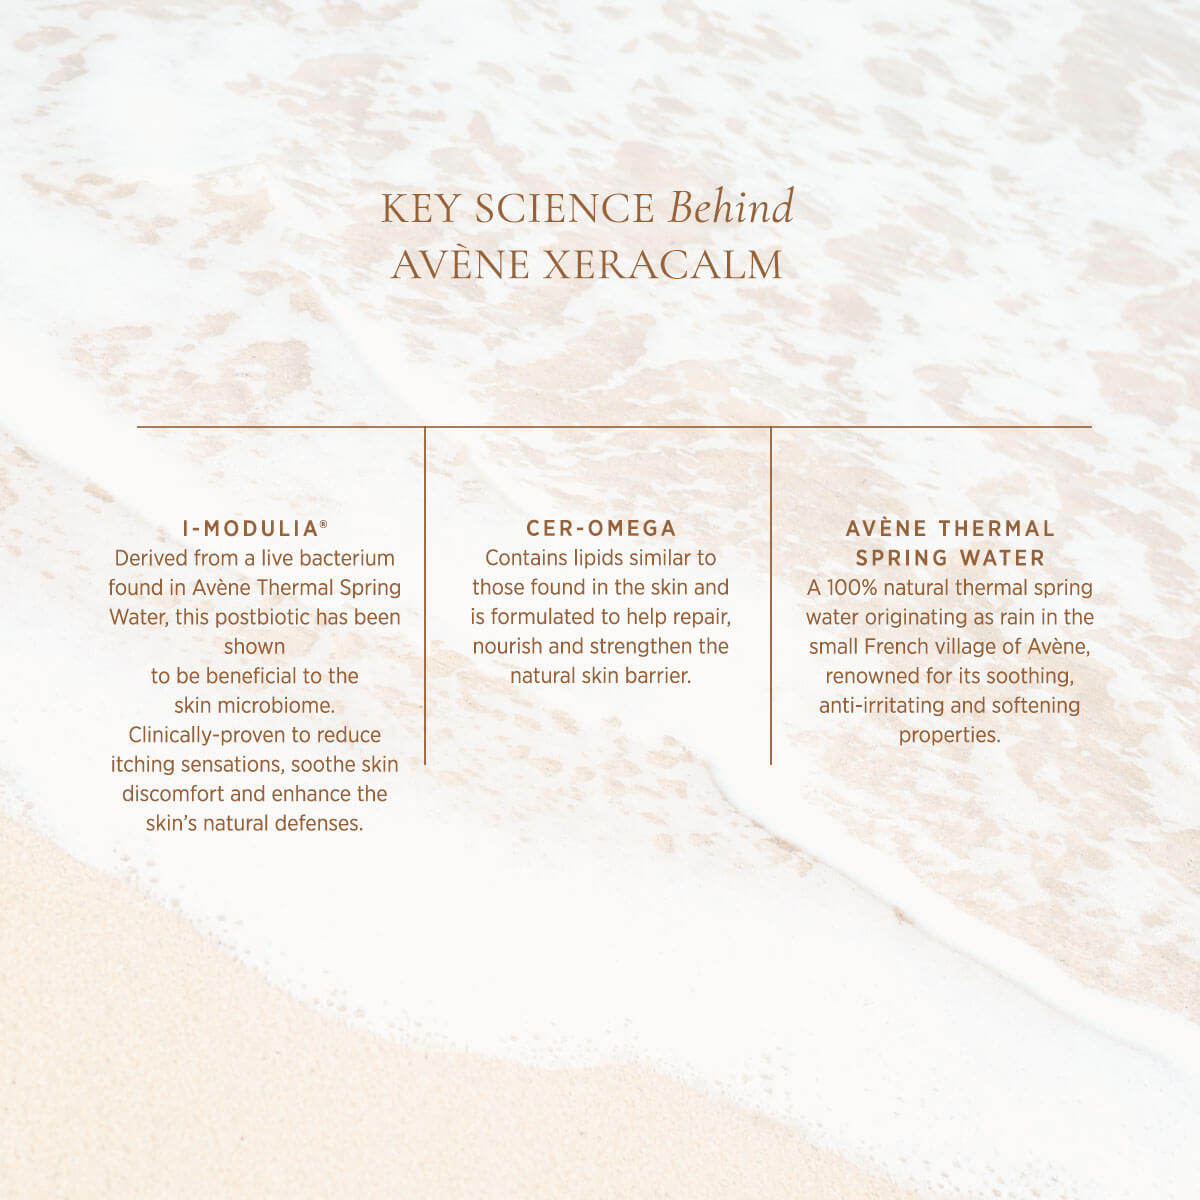 Avene XeraCalm, Ingredients, Atopic Eczema